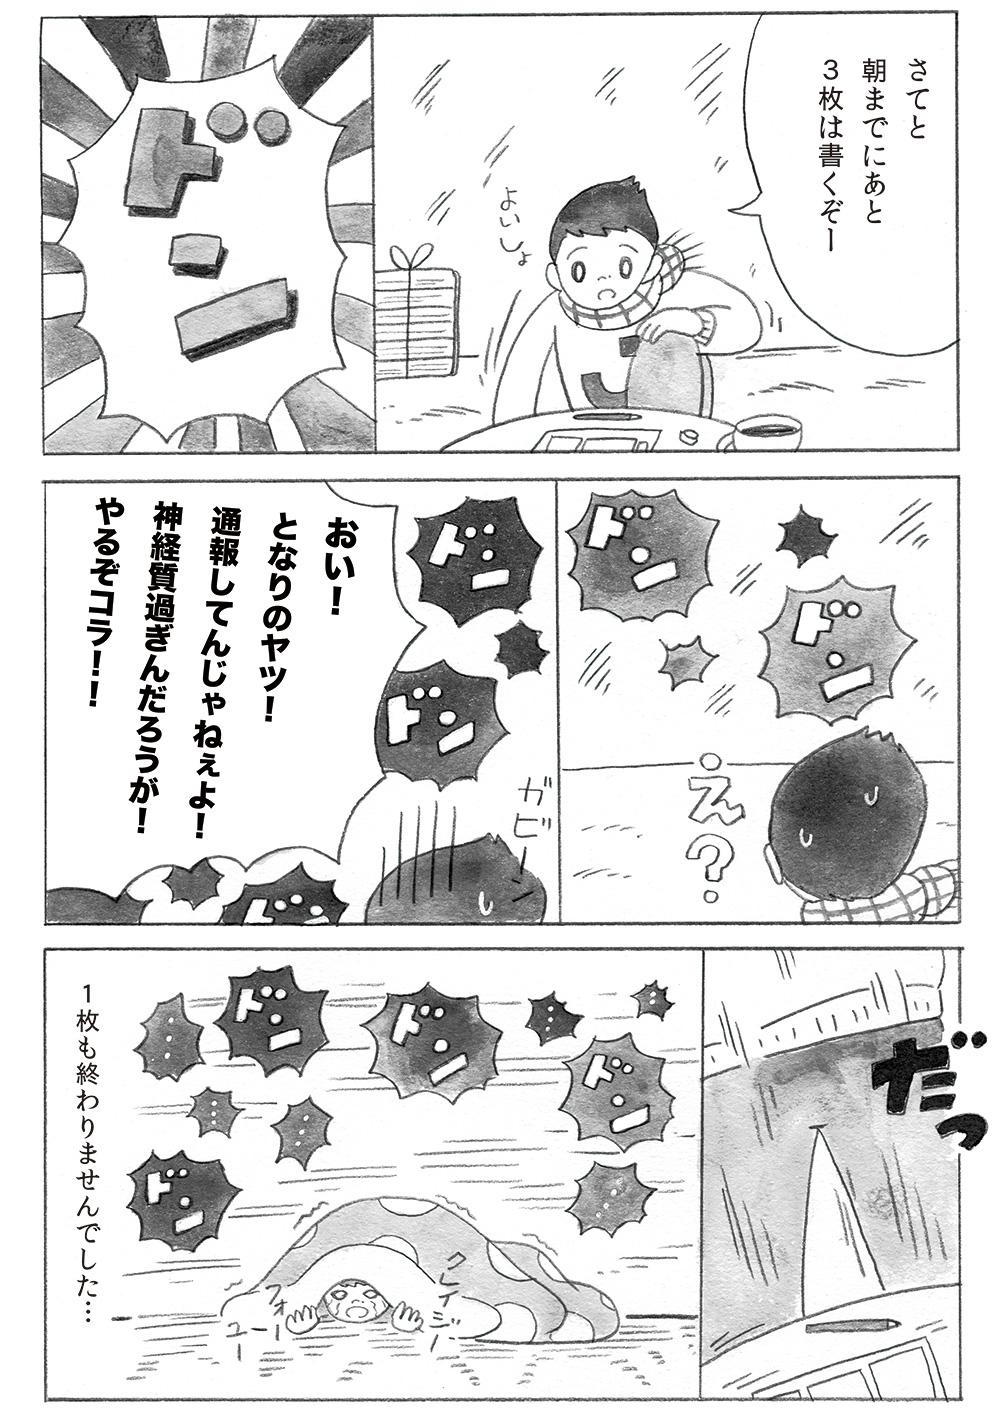 jimbo-satoshi-004-2